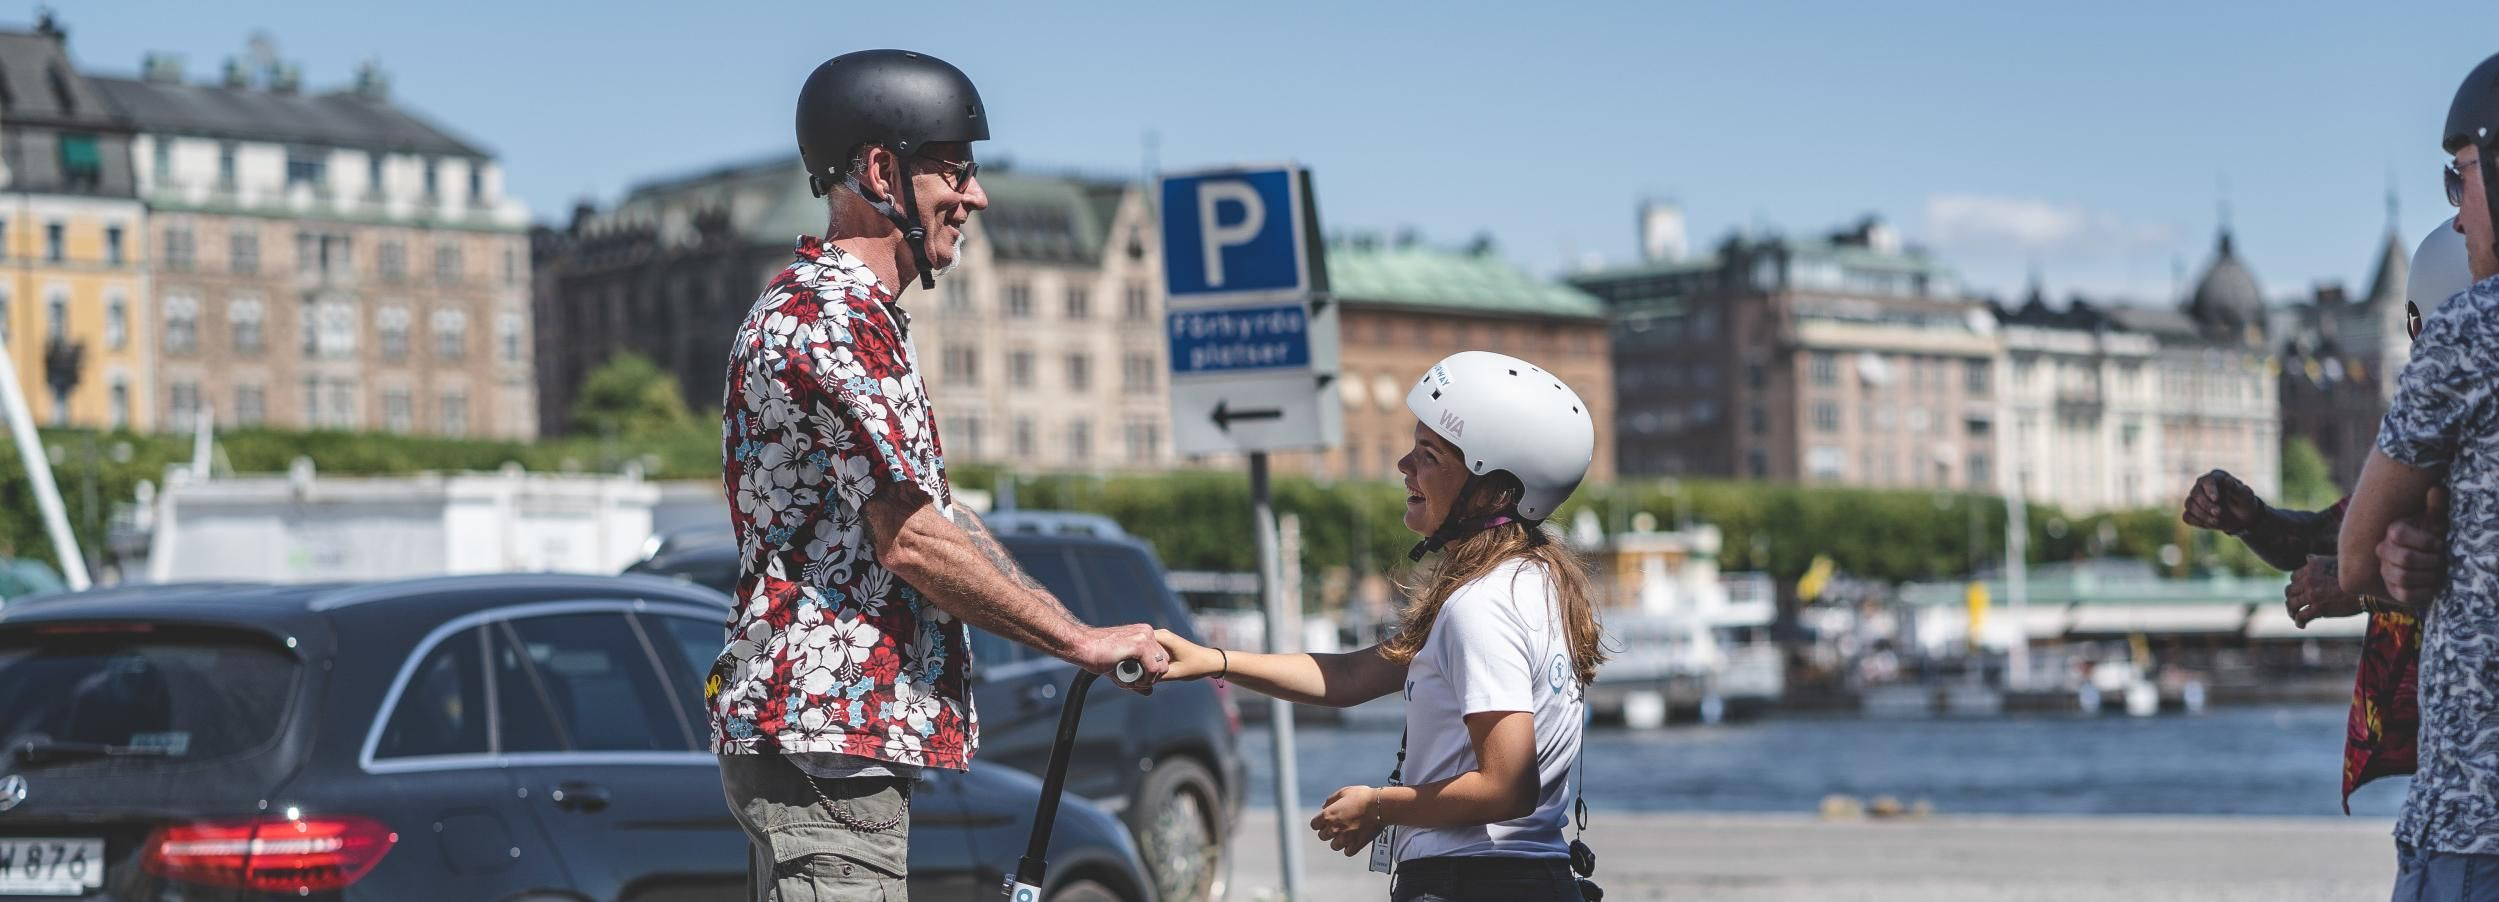 Stoccolma: tour in segway del Djurgården